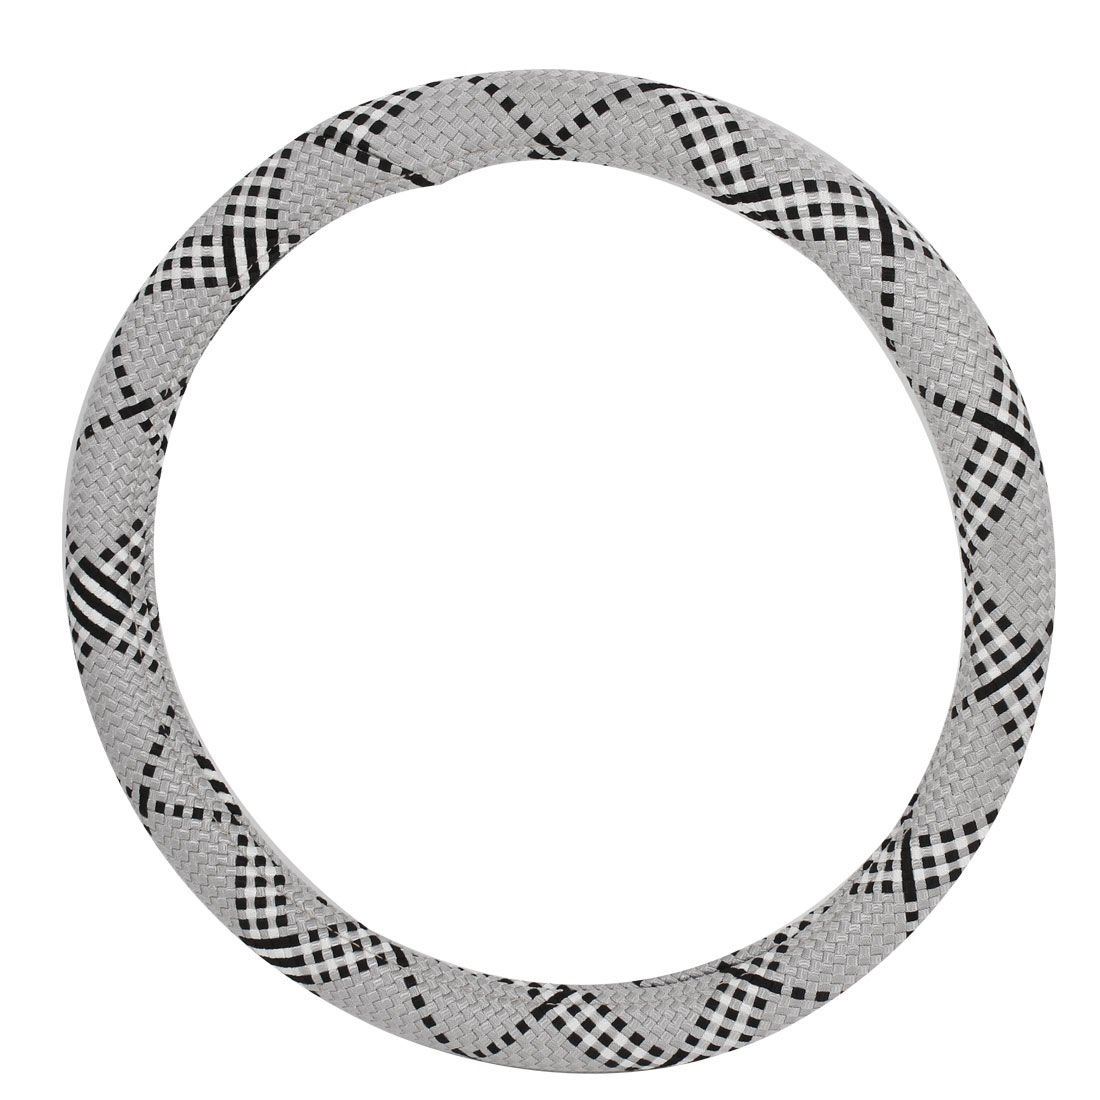 Car Woven Style Nylon Steering Wheel Cover Protector 38cm Diameter Gray